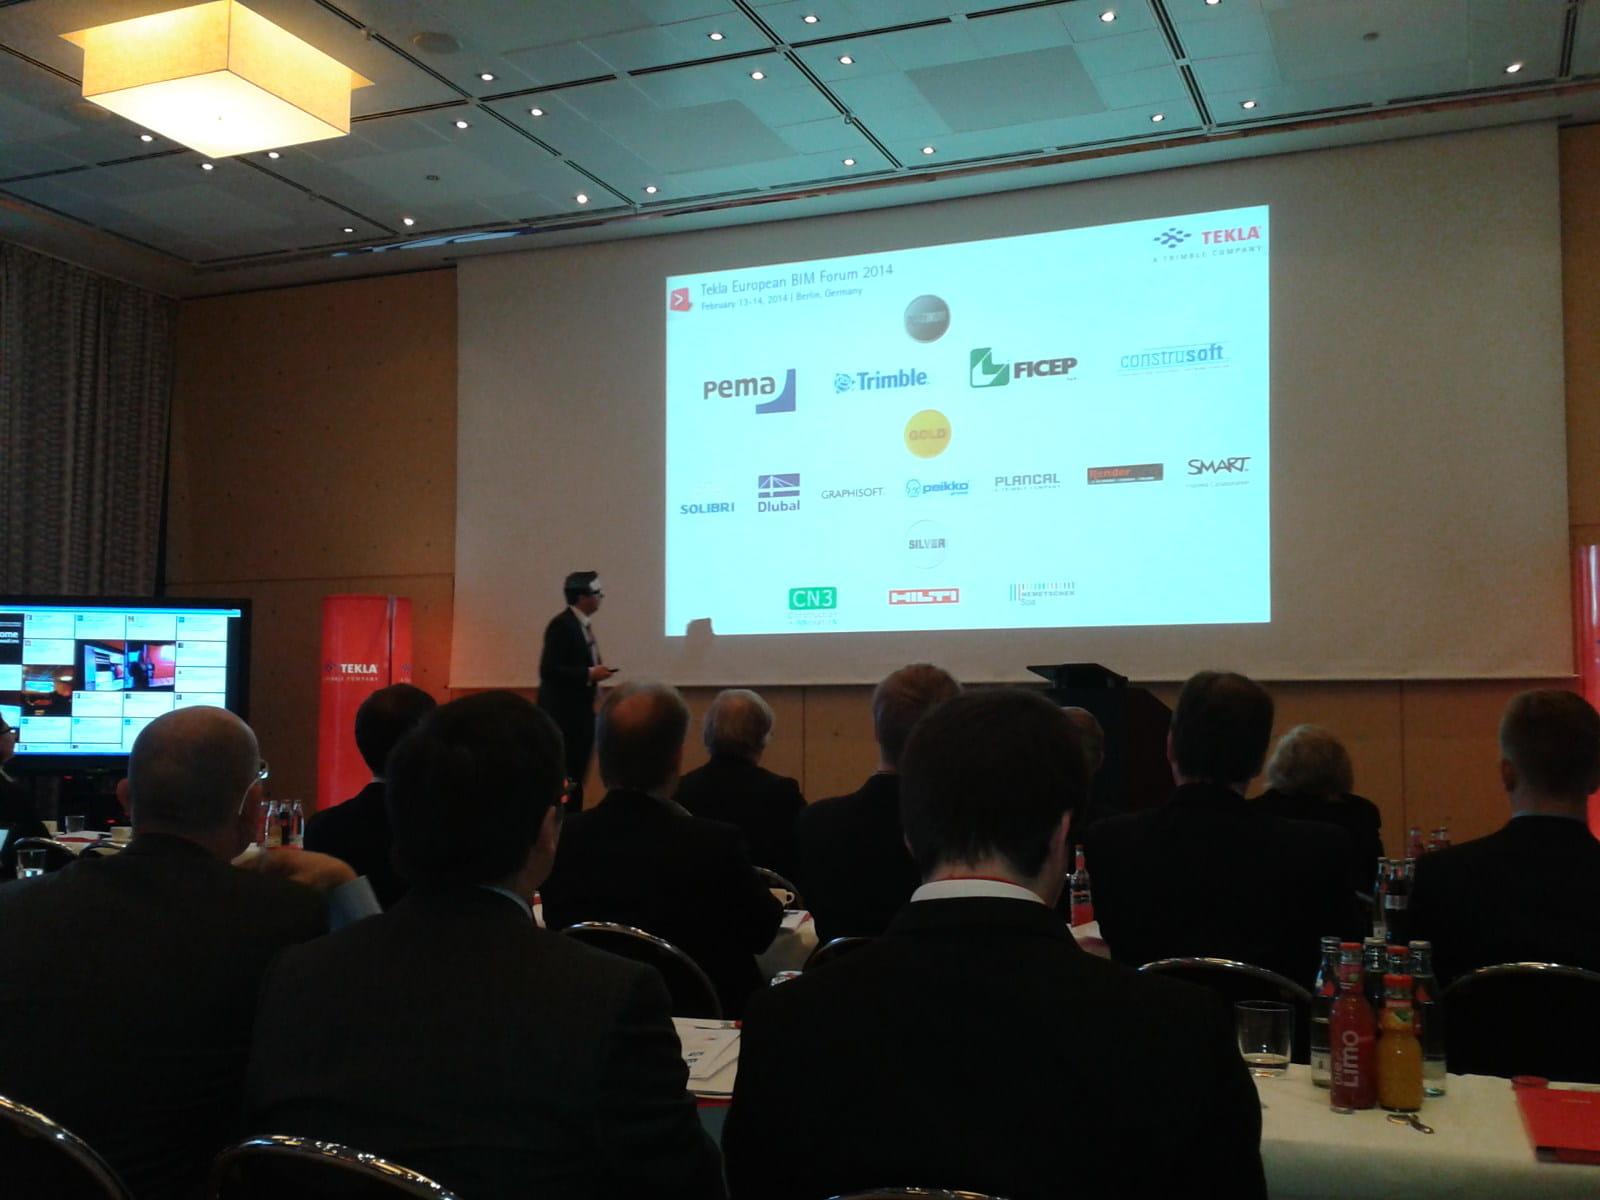 Dlubal Software at Tekla BIM Forum in Berlin | Dlubal Software